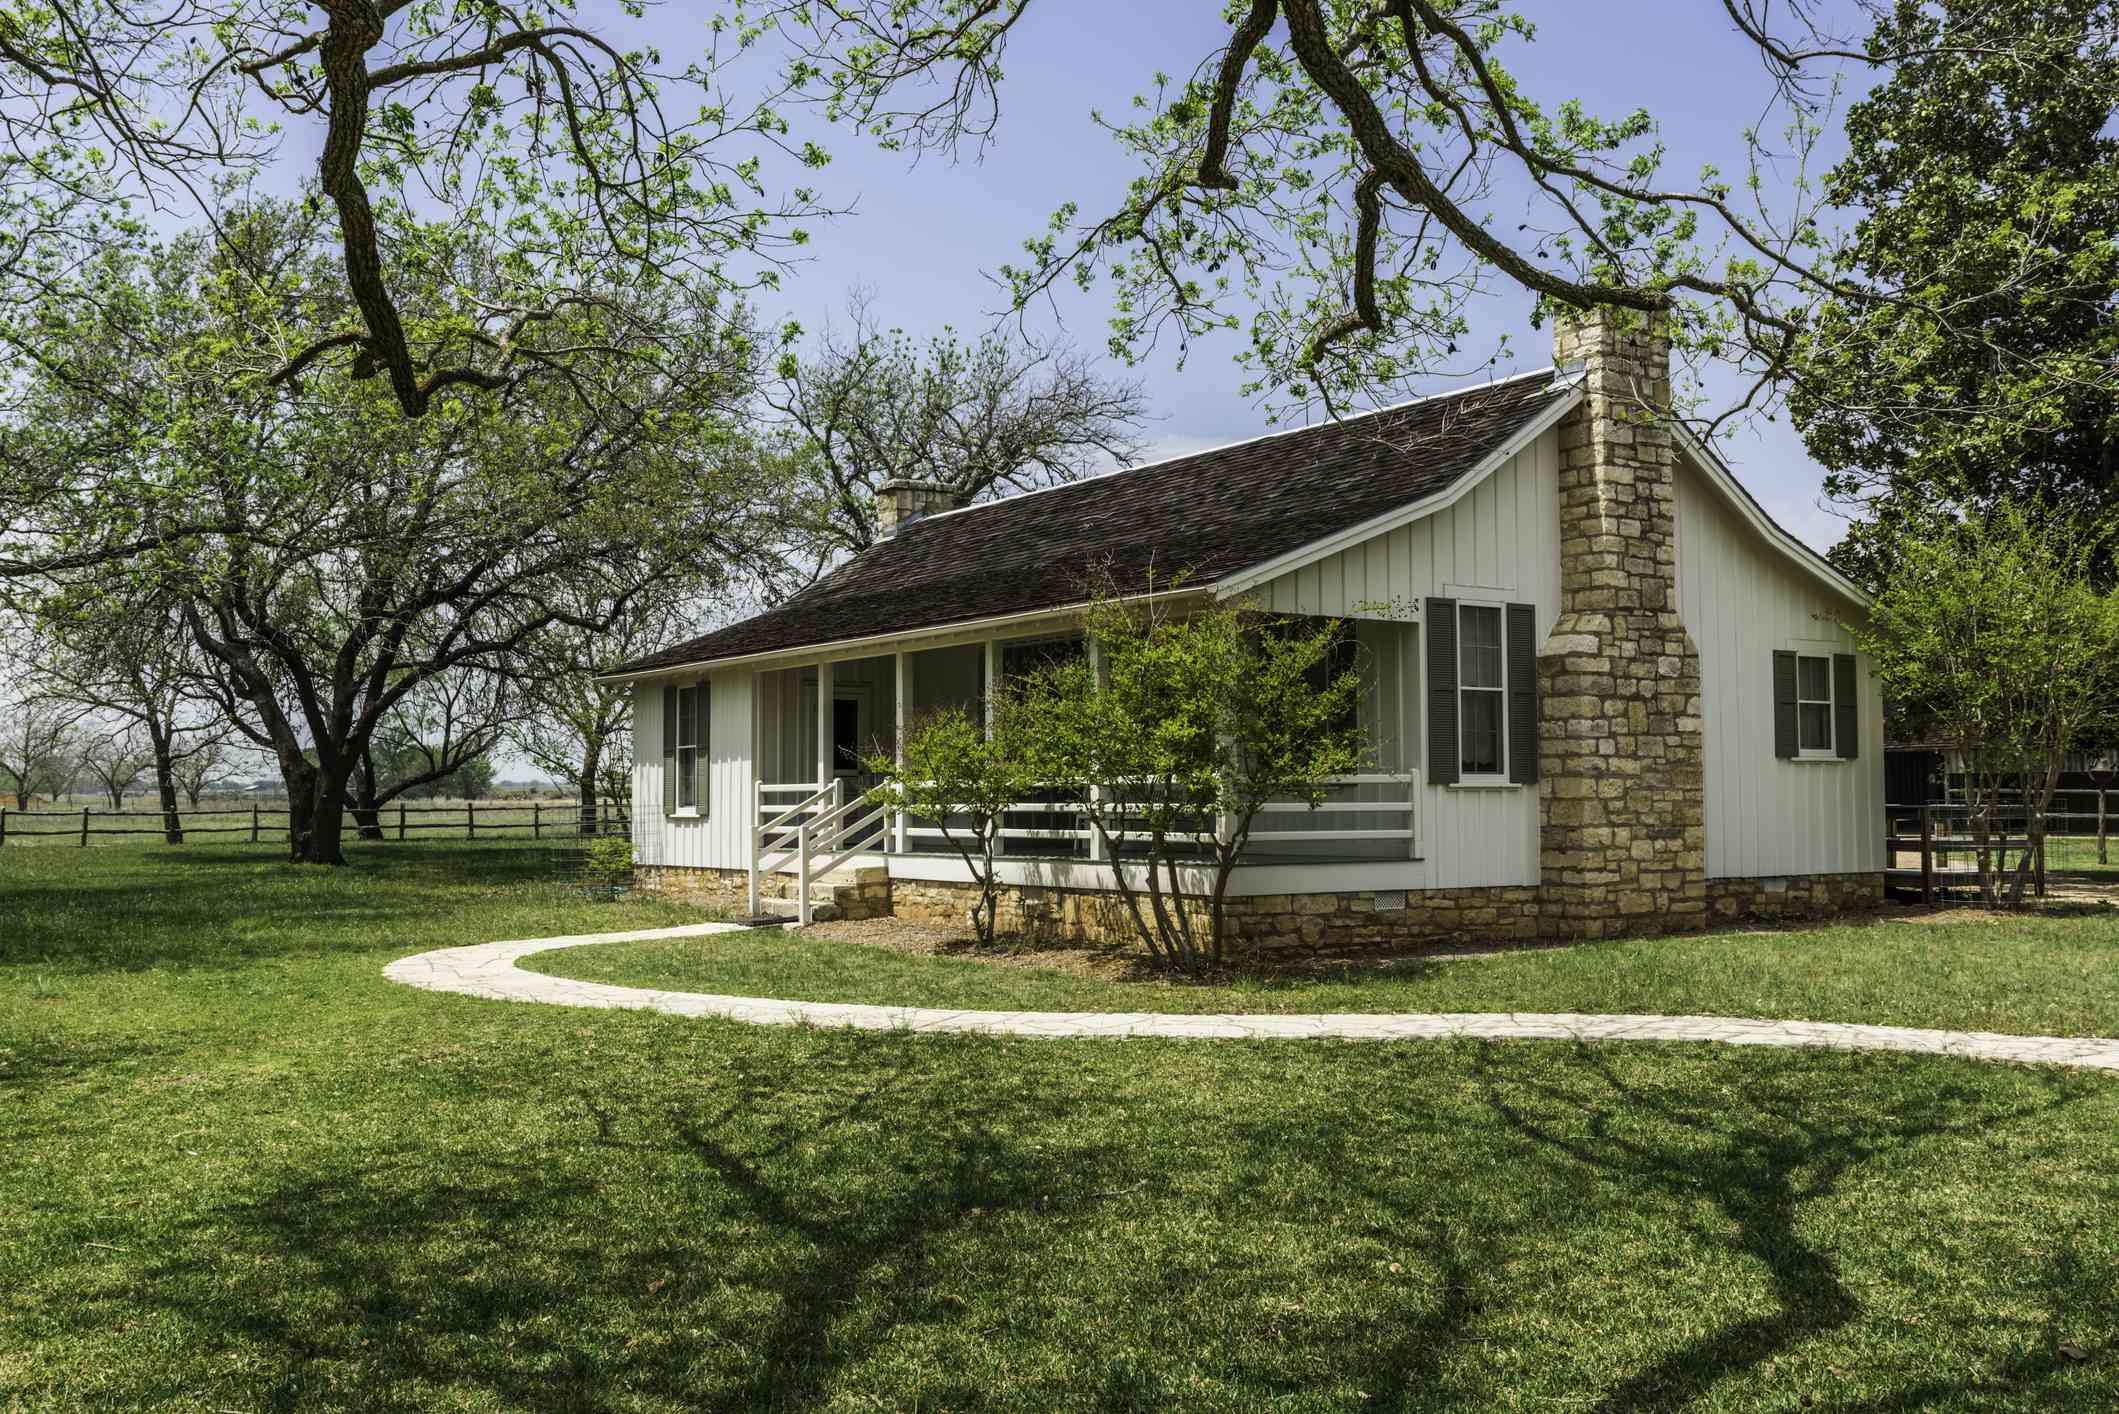 Boyhood home of Lyndon B. Johnson National Historic Park